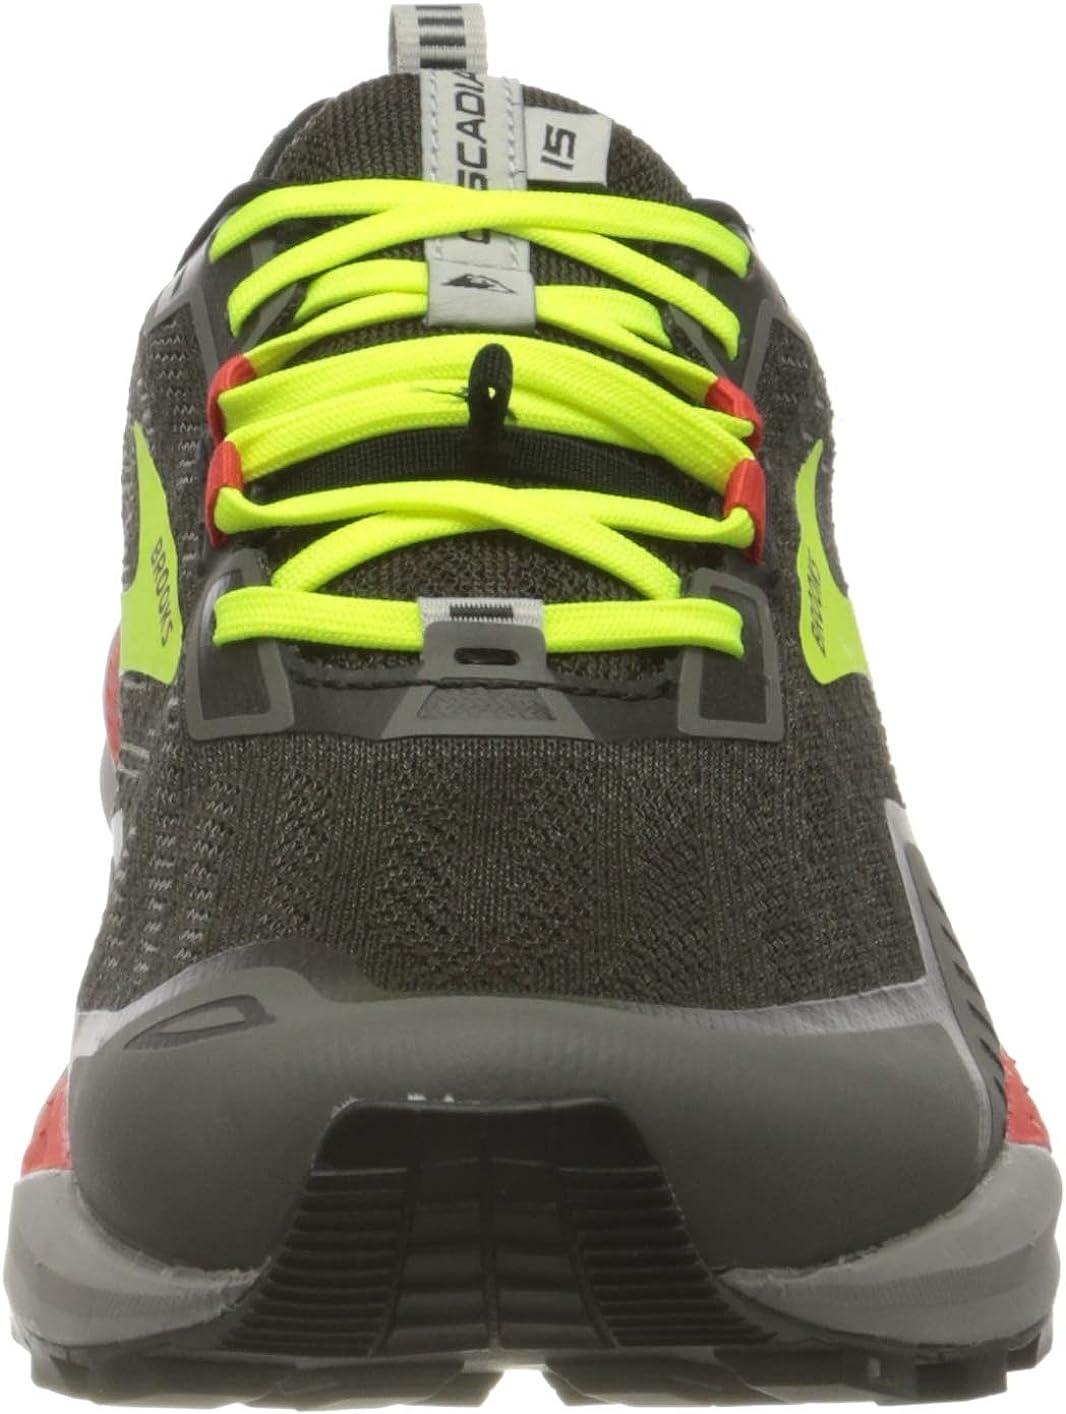 Brooks Mens Cascadia GTX 15 Running Shoe